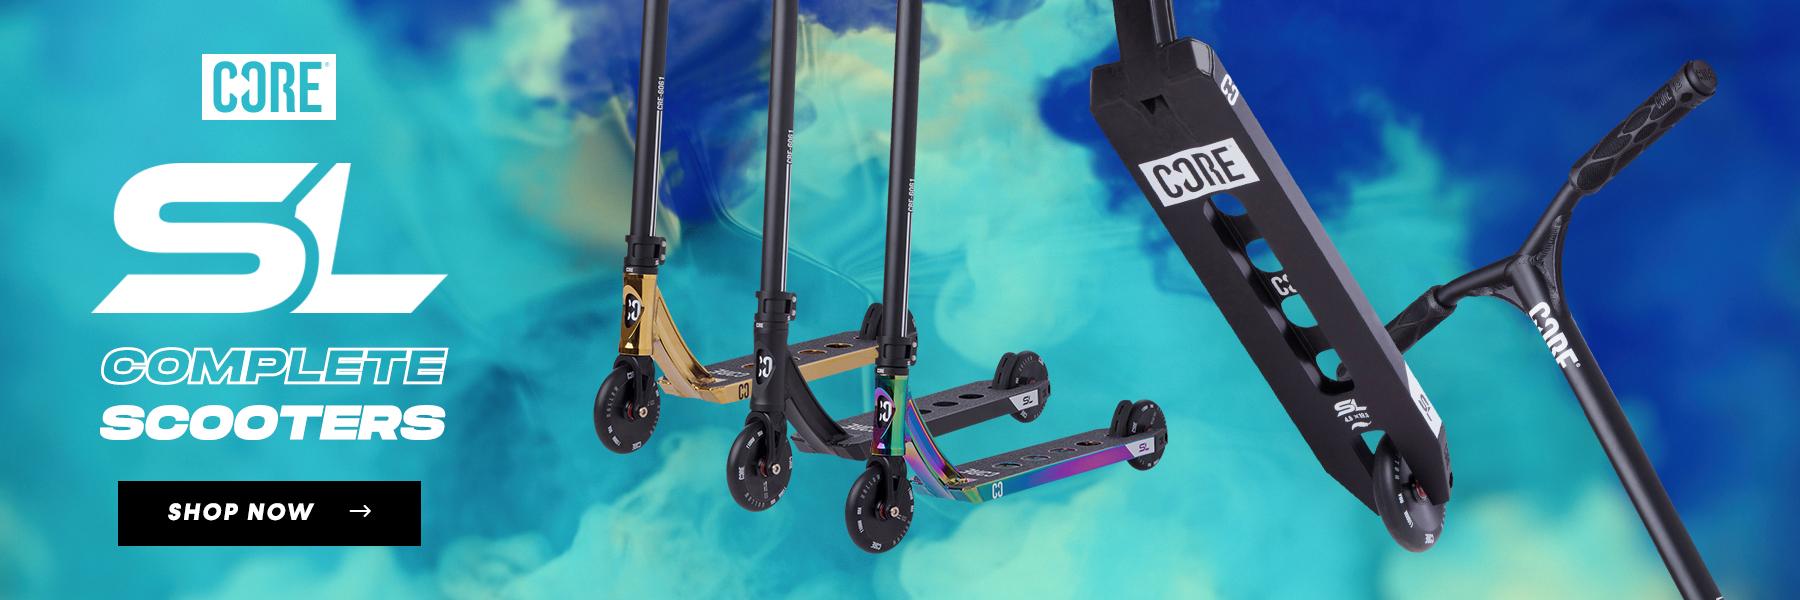 Core SL1 Stunt Scooters